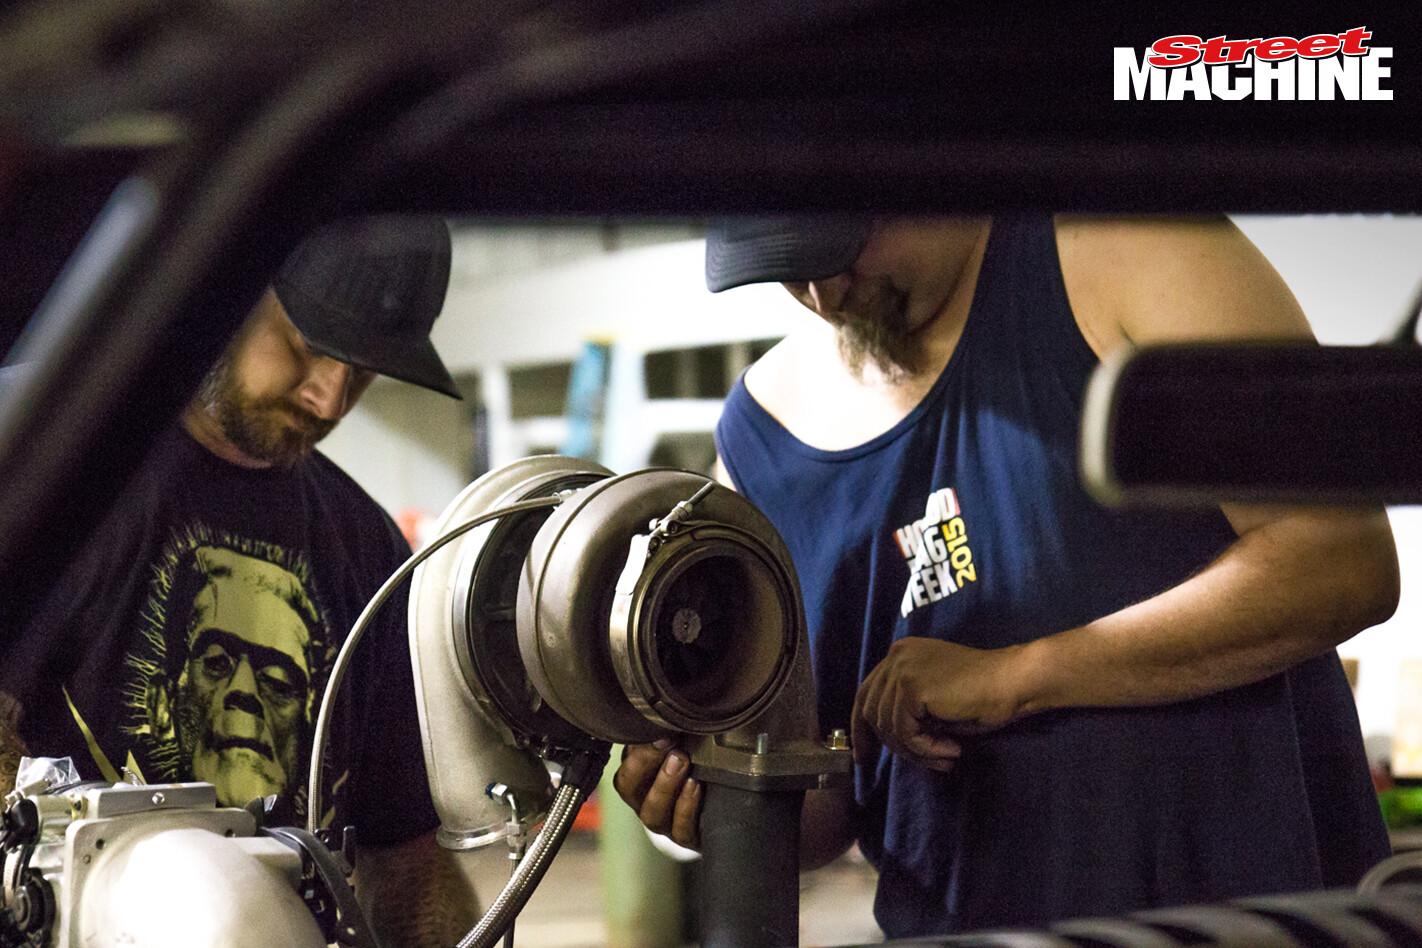 Chevy Chevelle Big Block Twin Turbo Drag Week 6